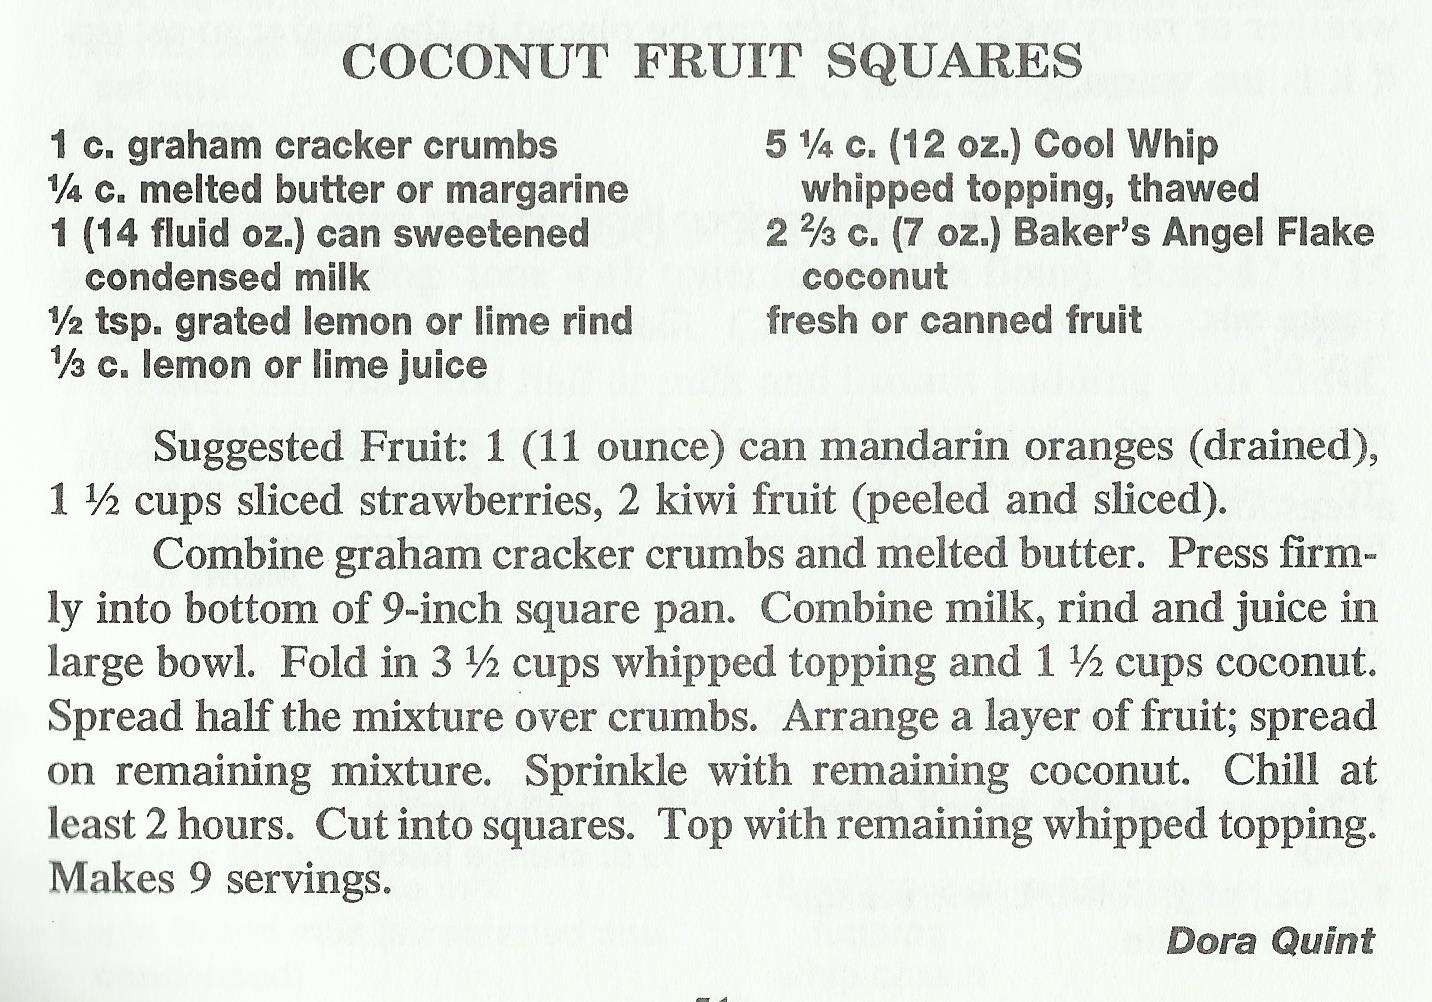 Coconut Fruit Squares